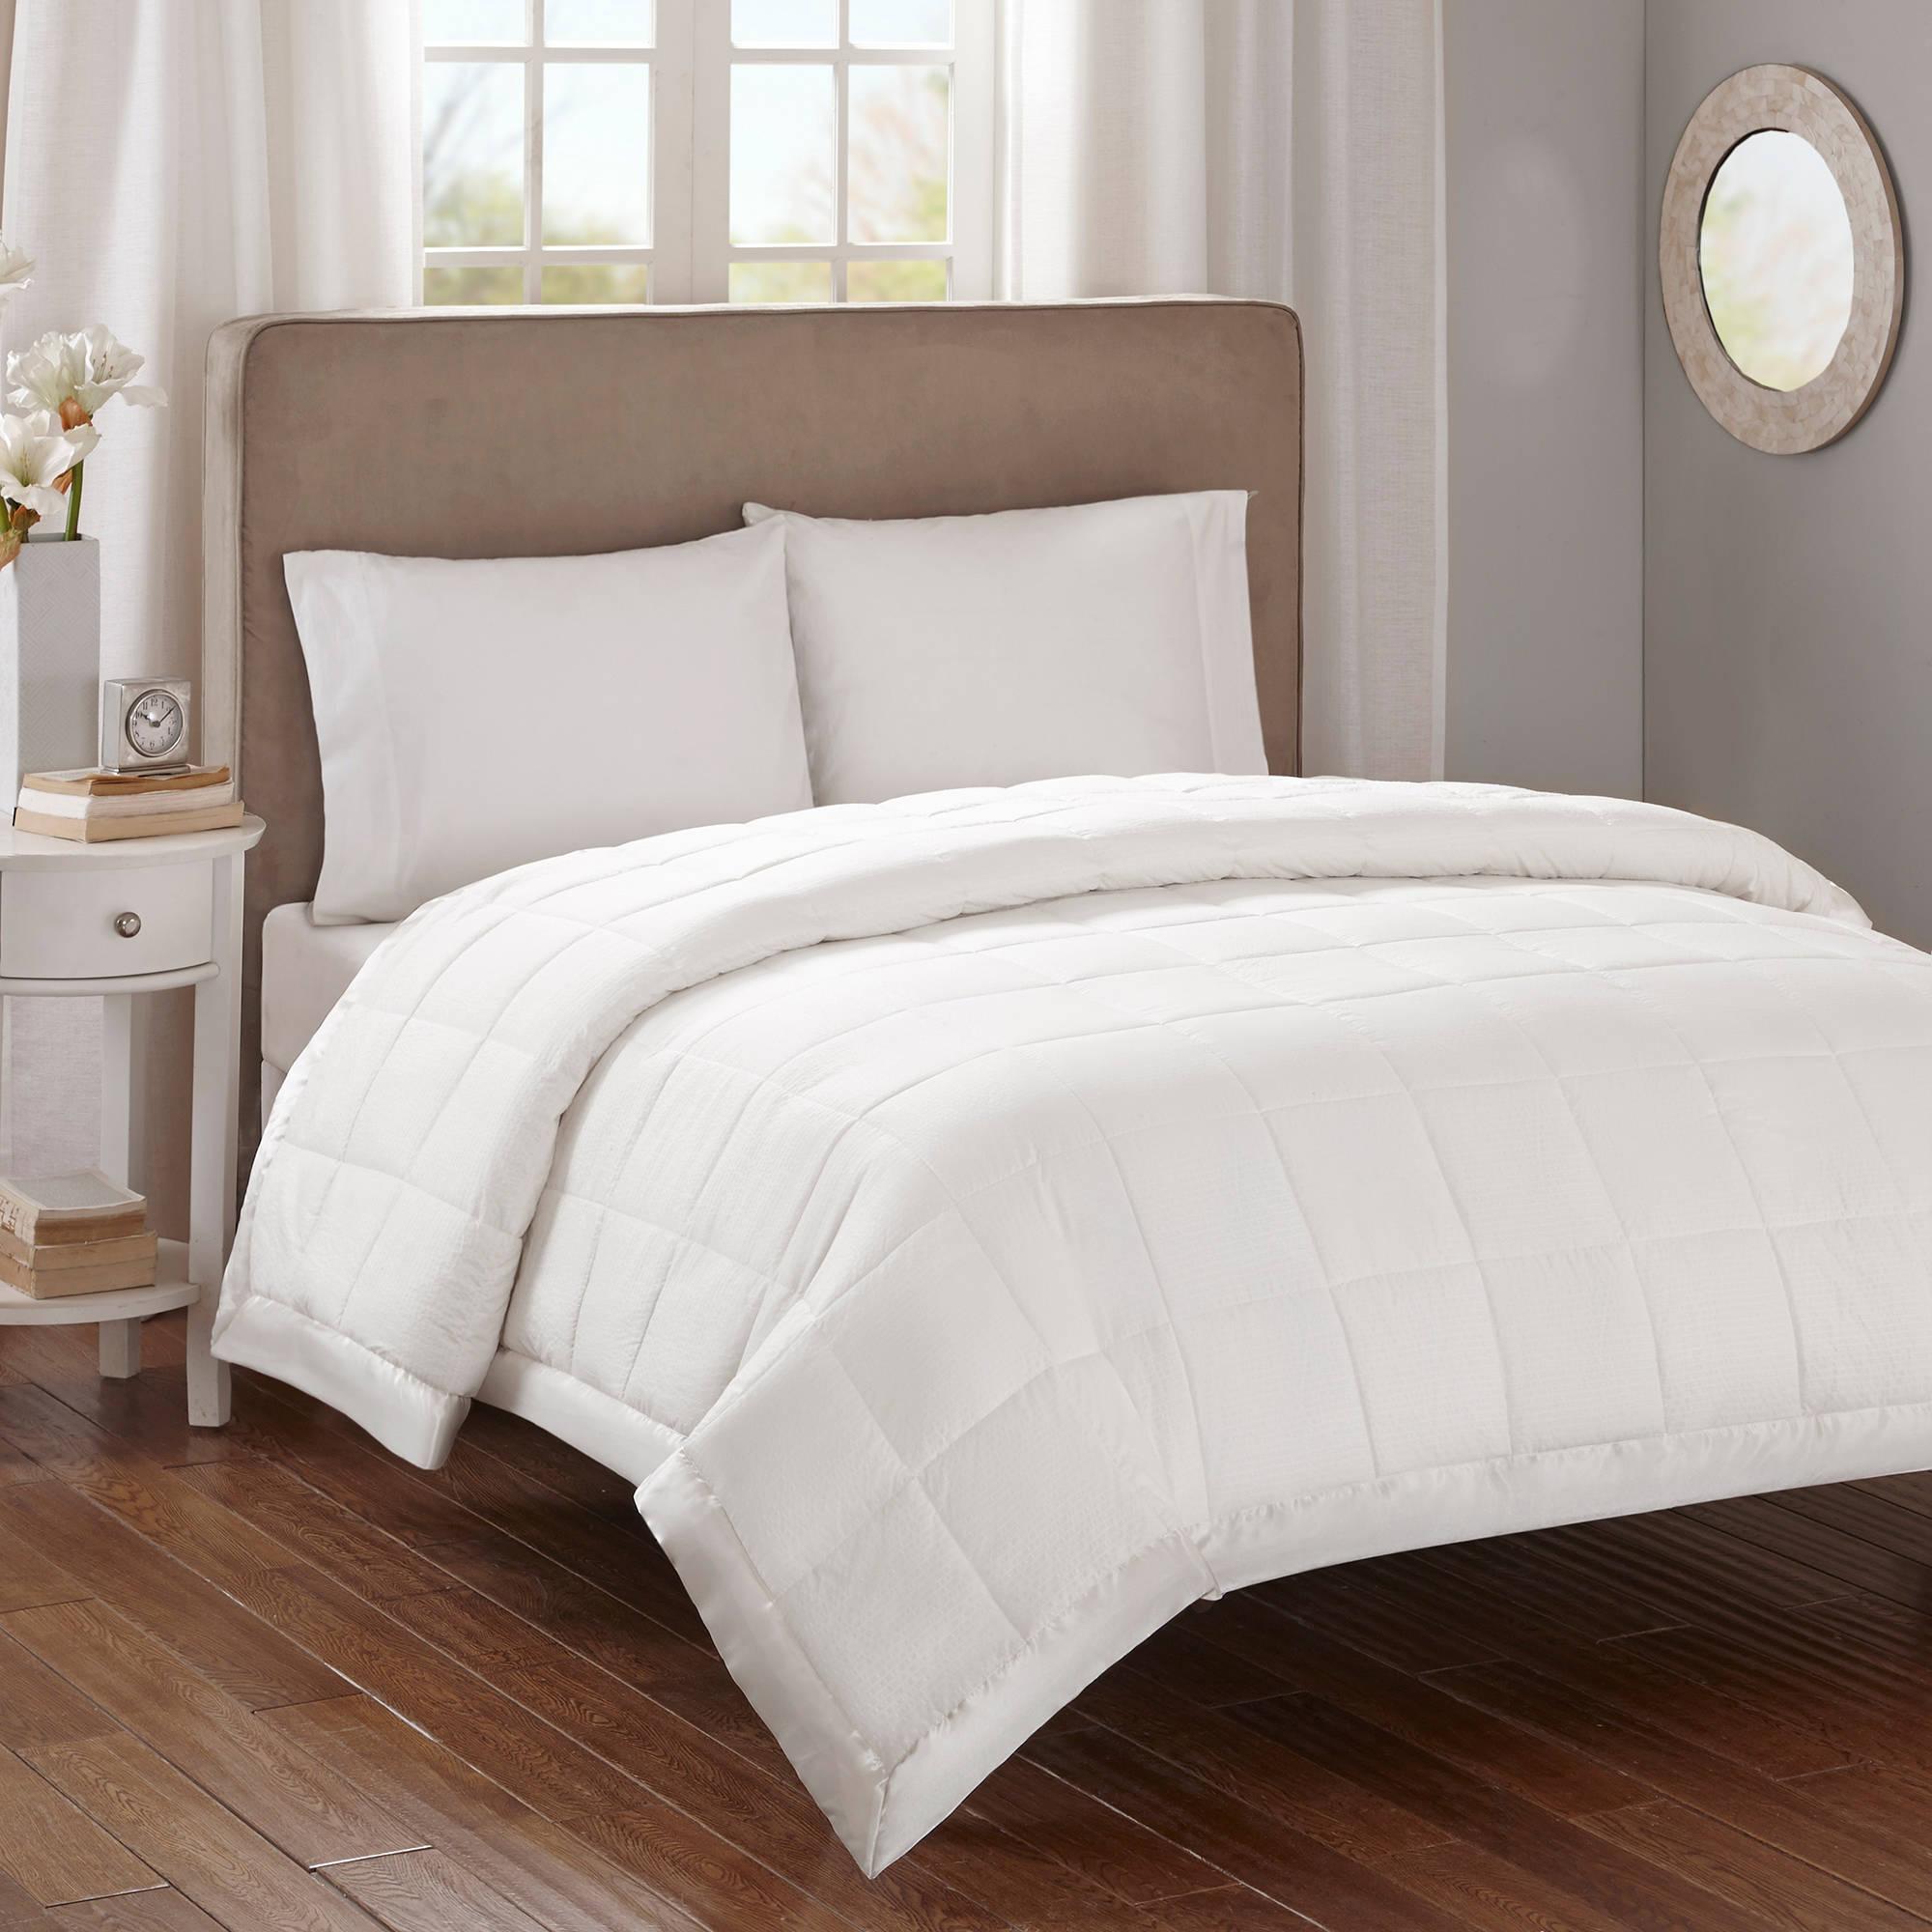 Premium Oversized Comfort Blanket Blanket for Providing A Distribution of Warmth.